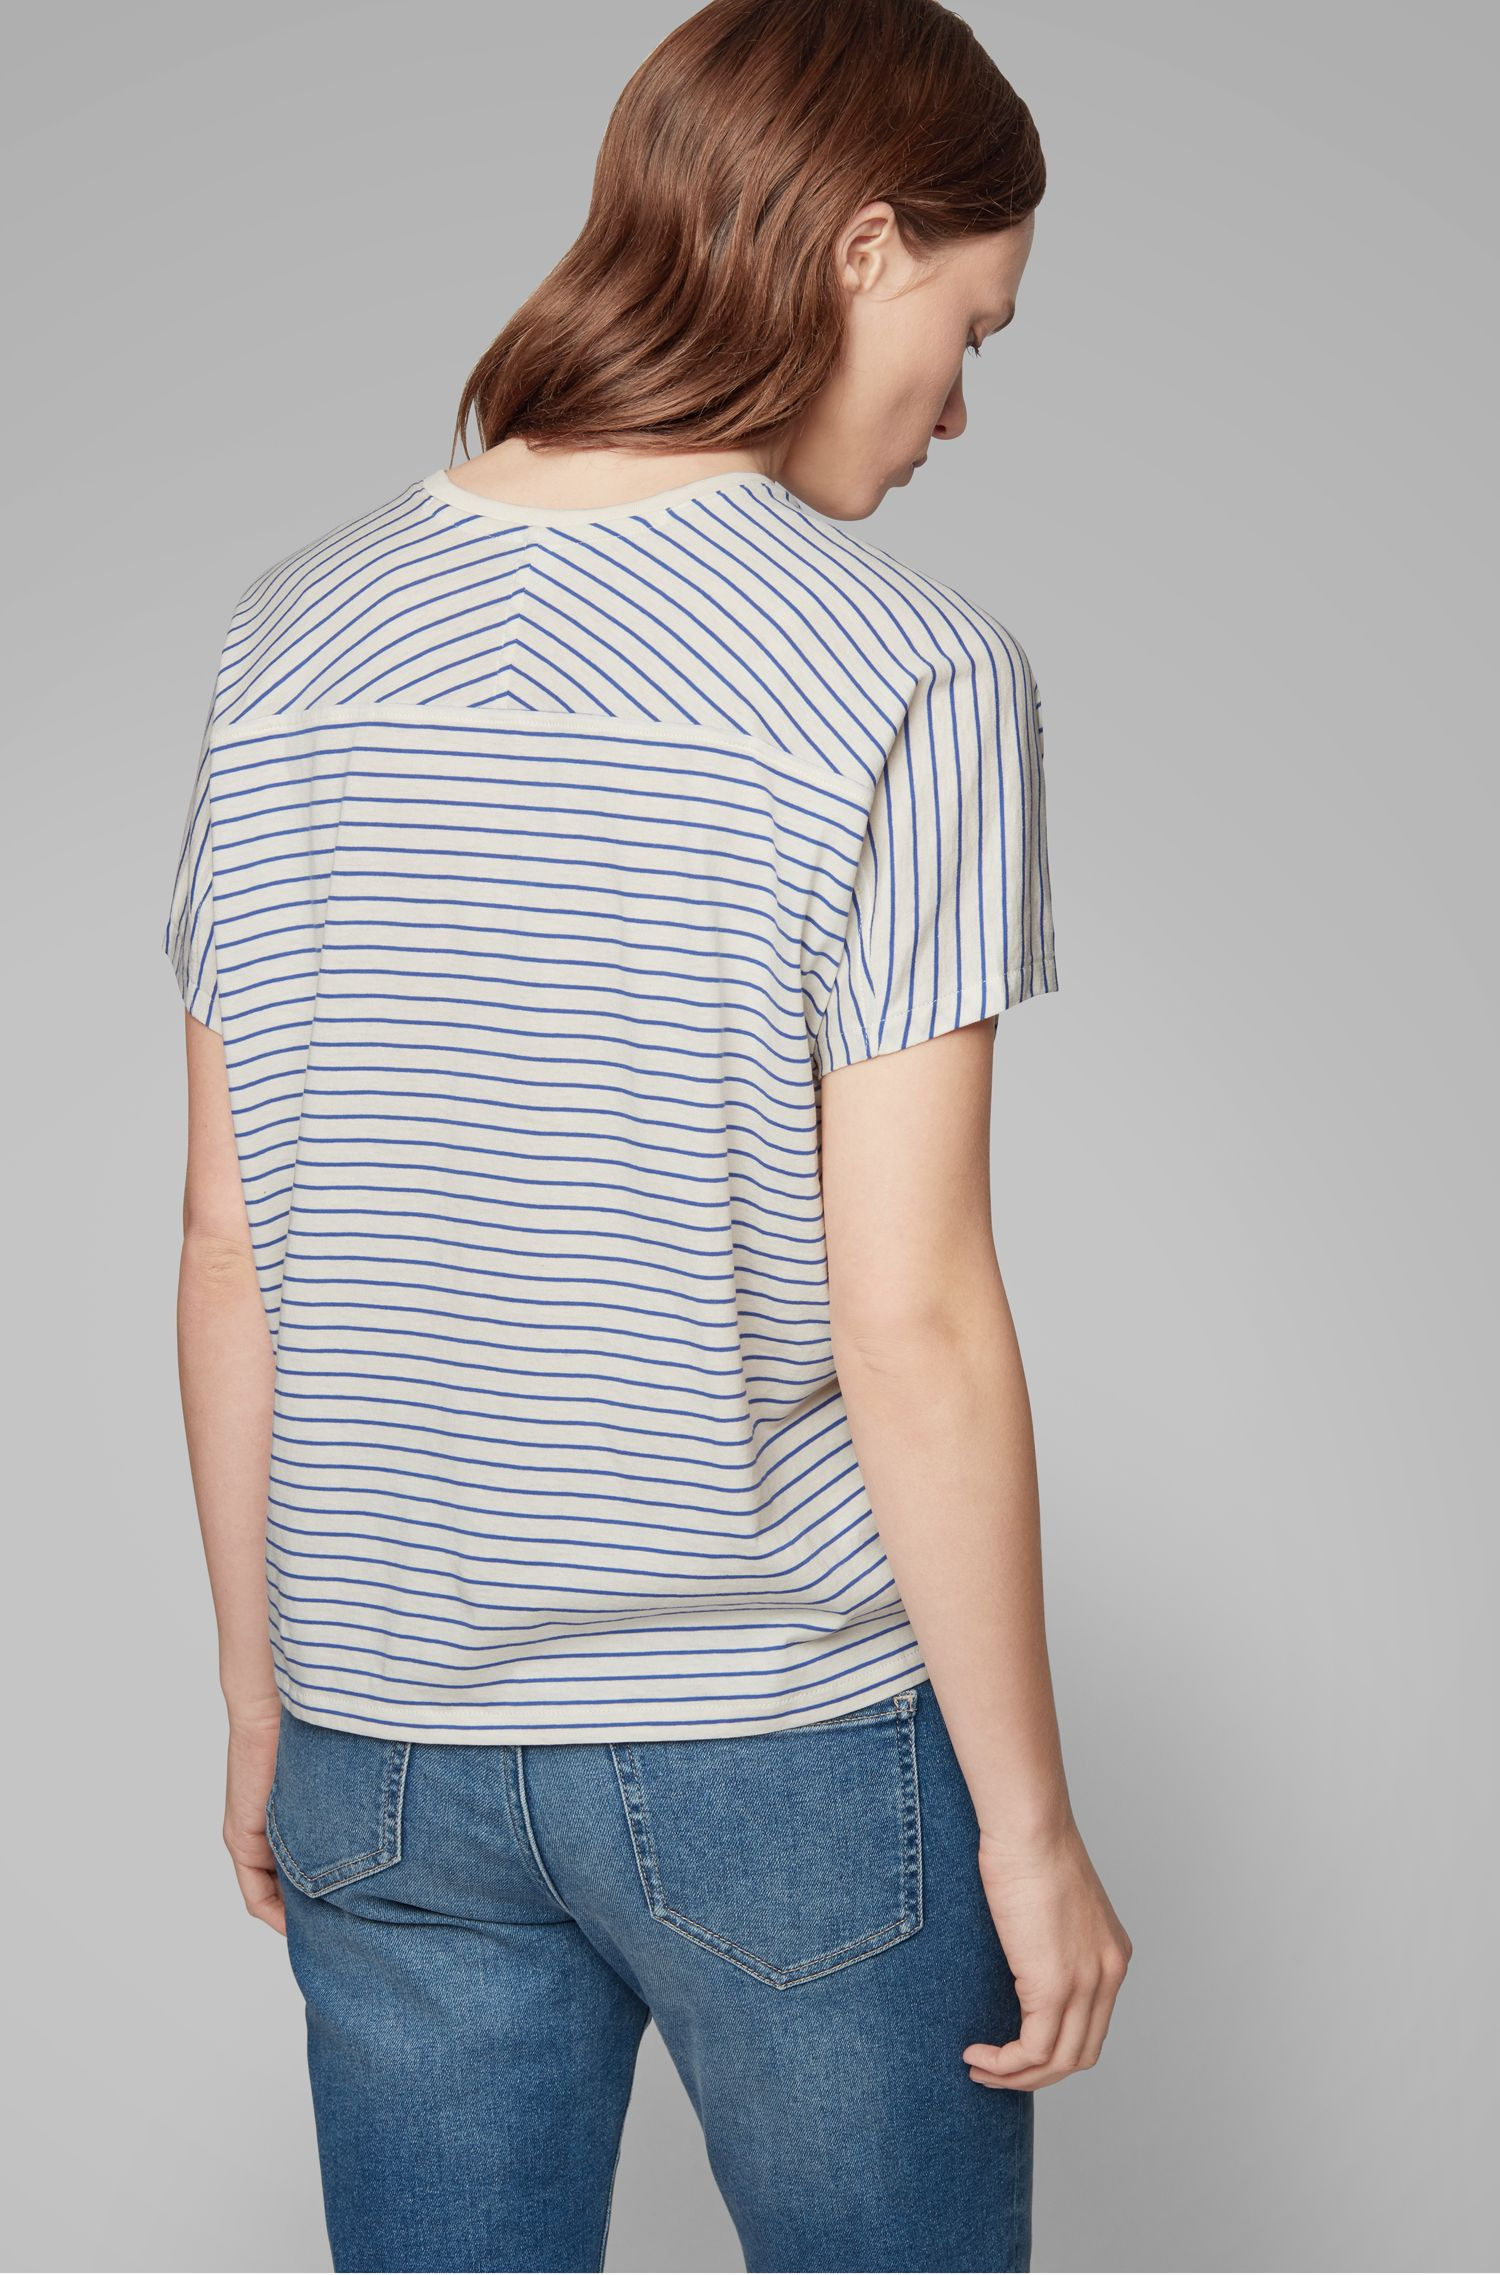 Camiseta extragrande a rayas en mezcla de algodón, Natural